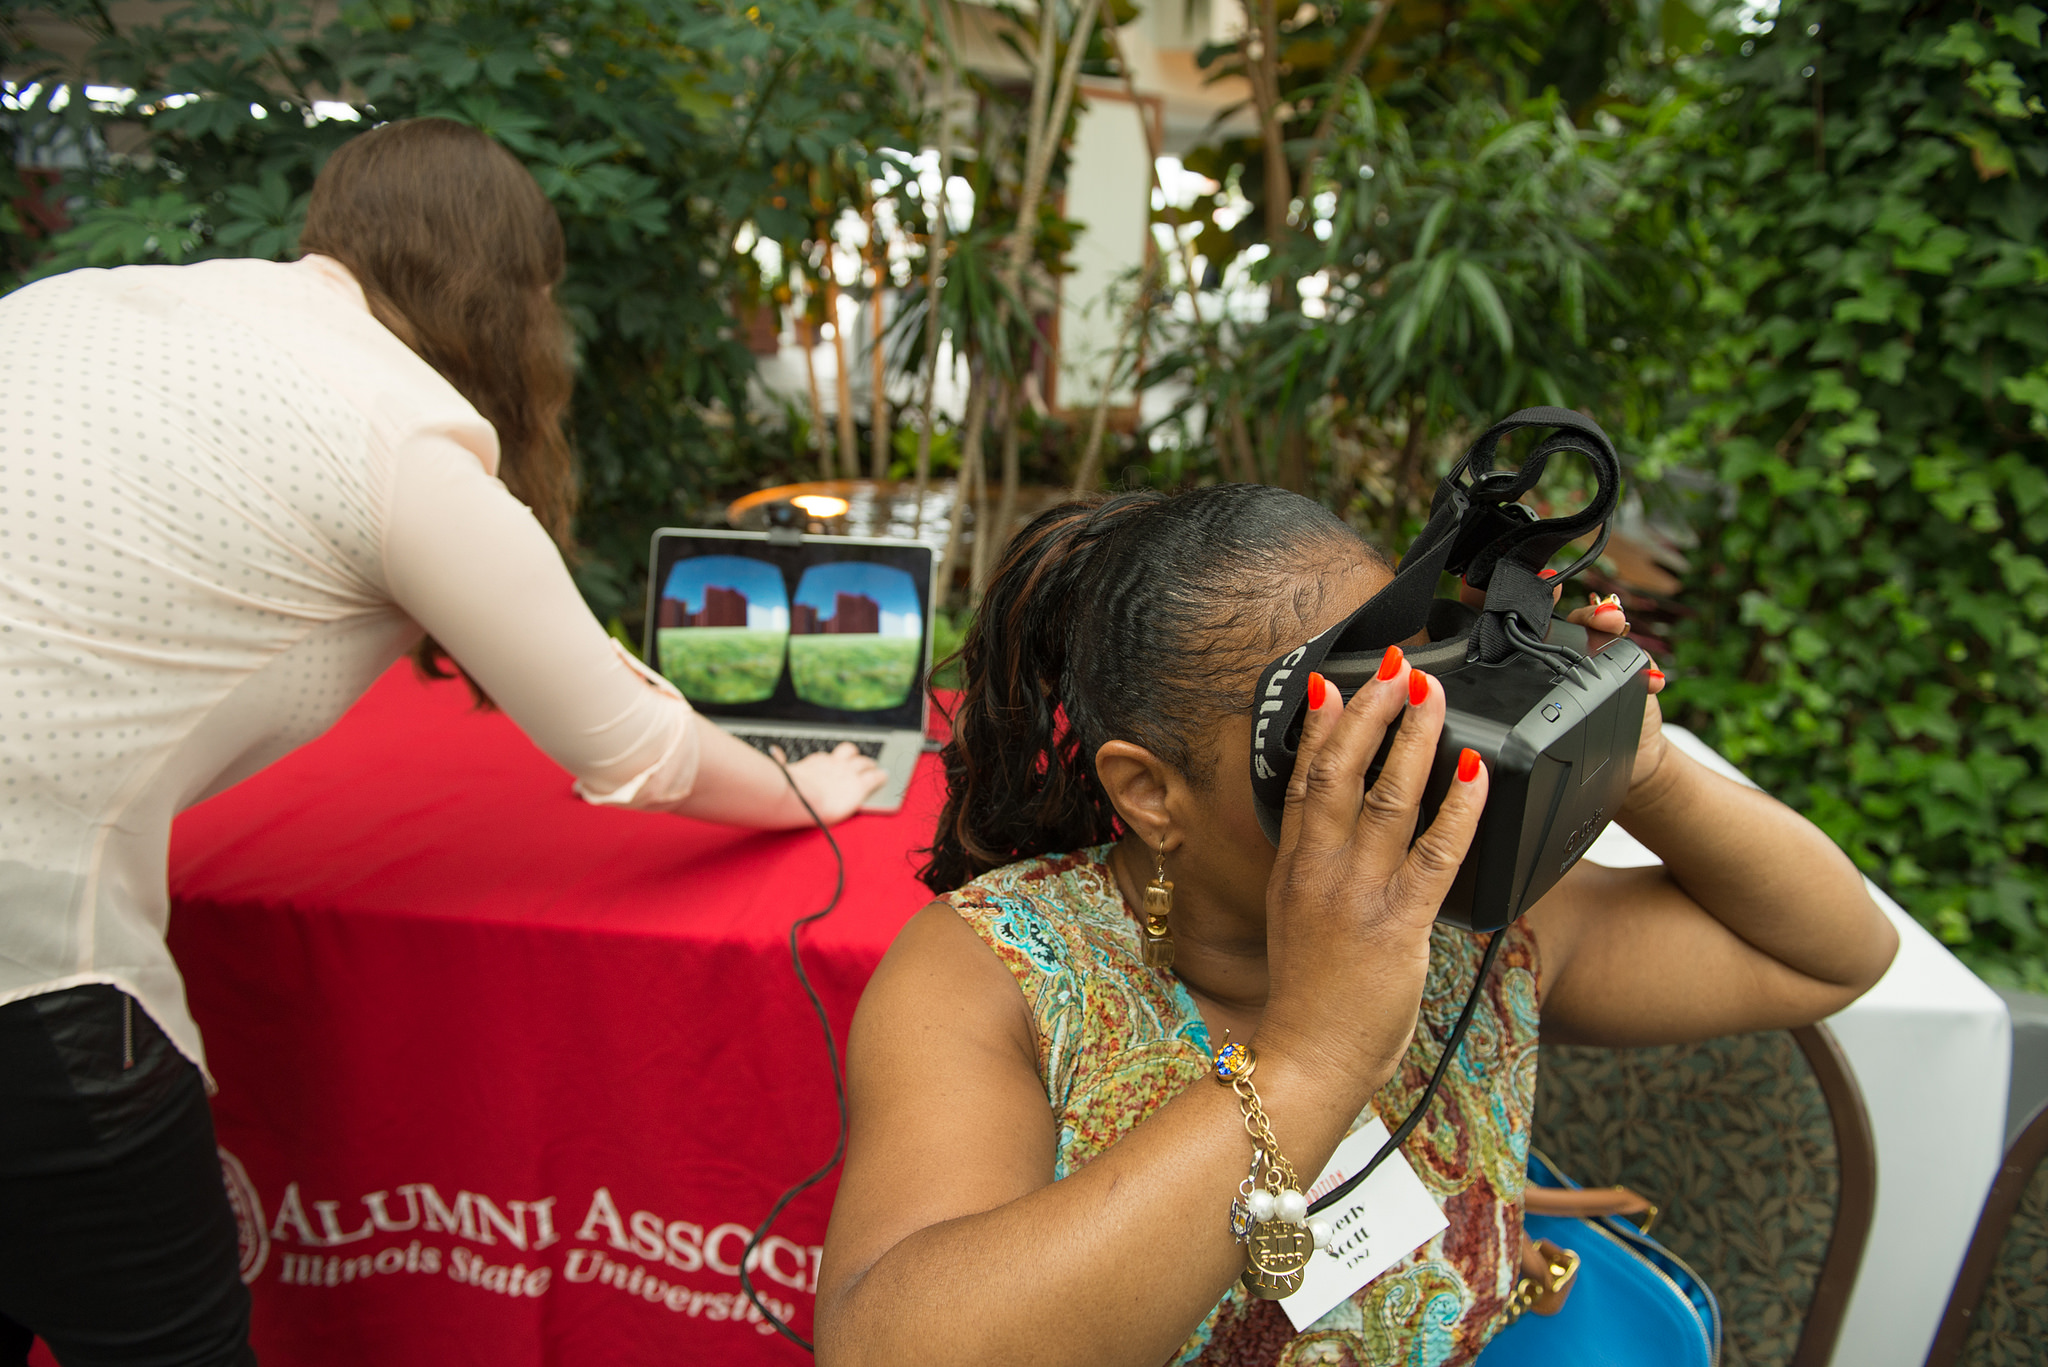 Alum uses VR goggles